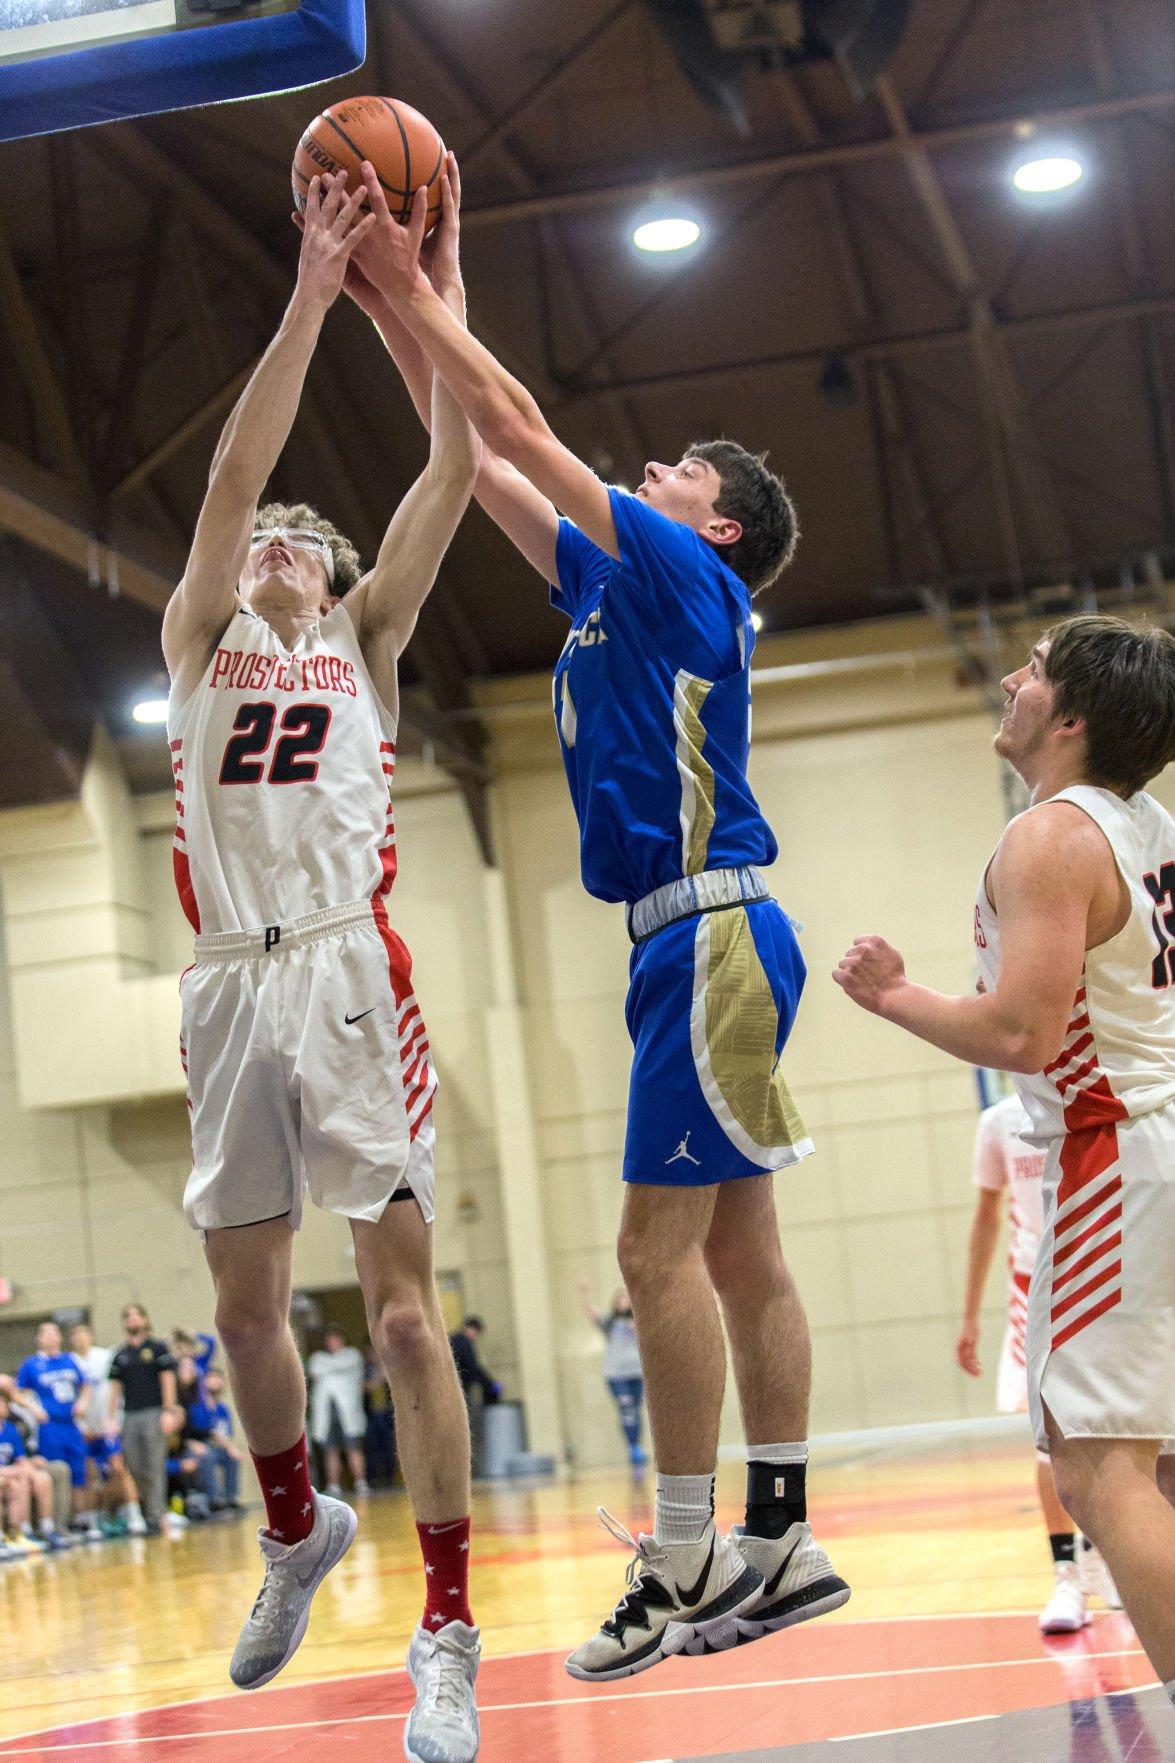 BMC Basketball Tournament   Pilot Rock vs. Grant Union